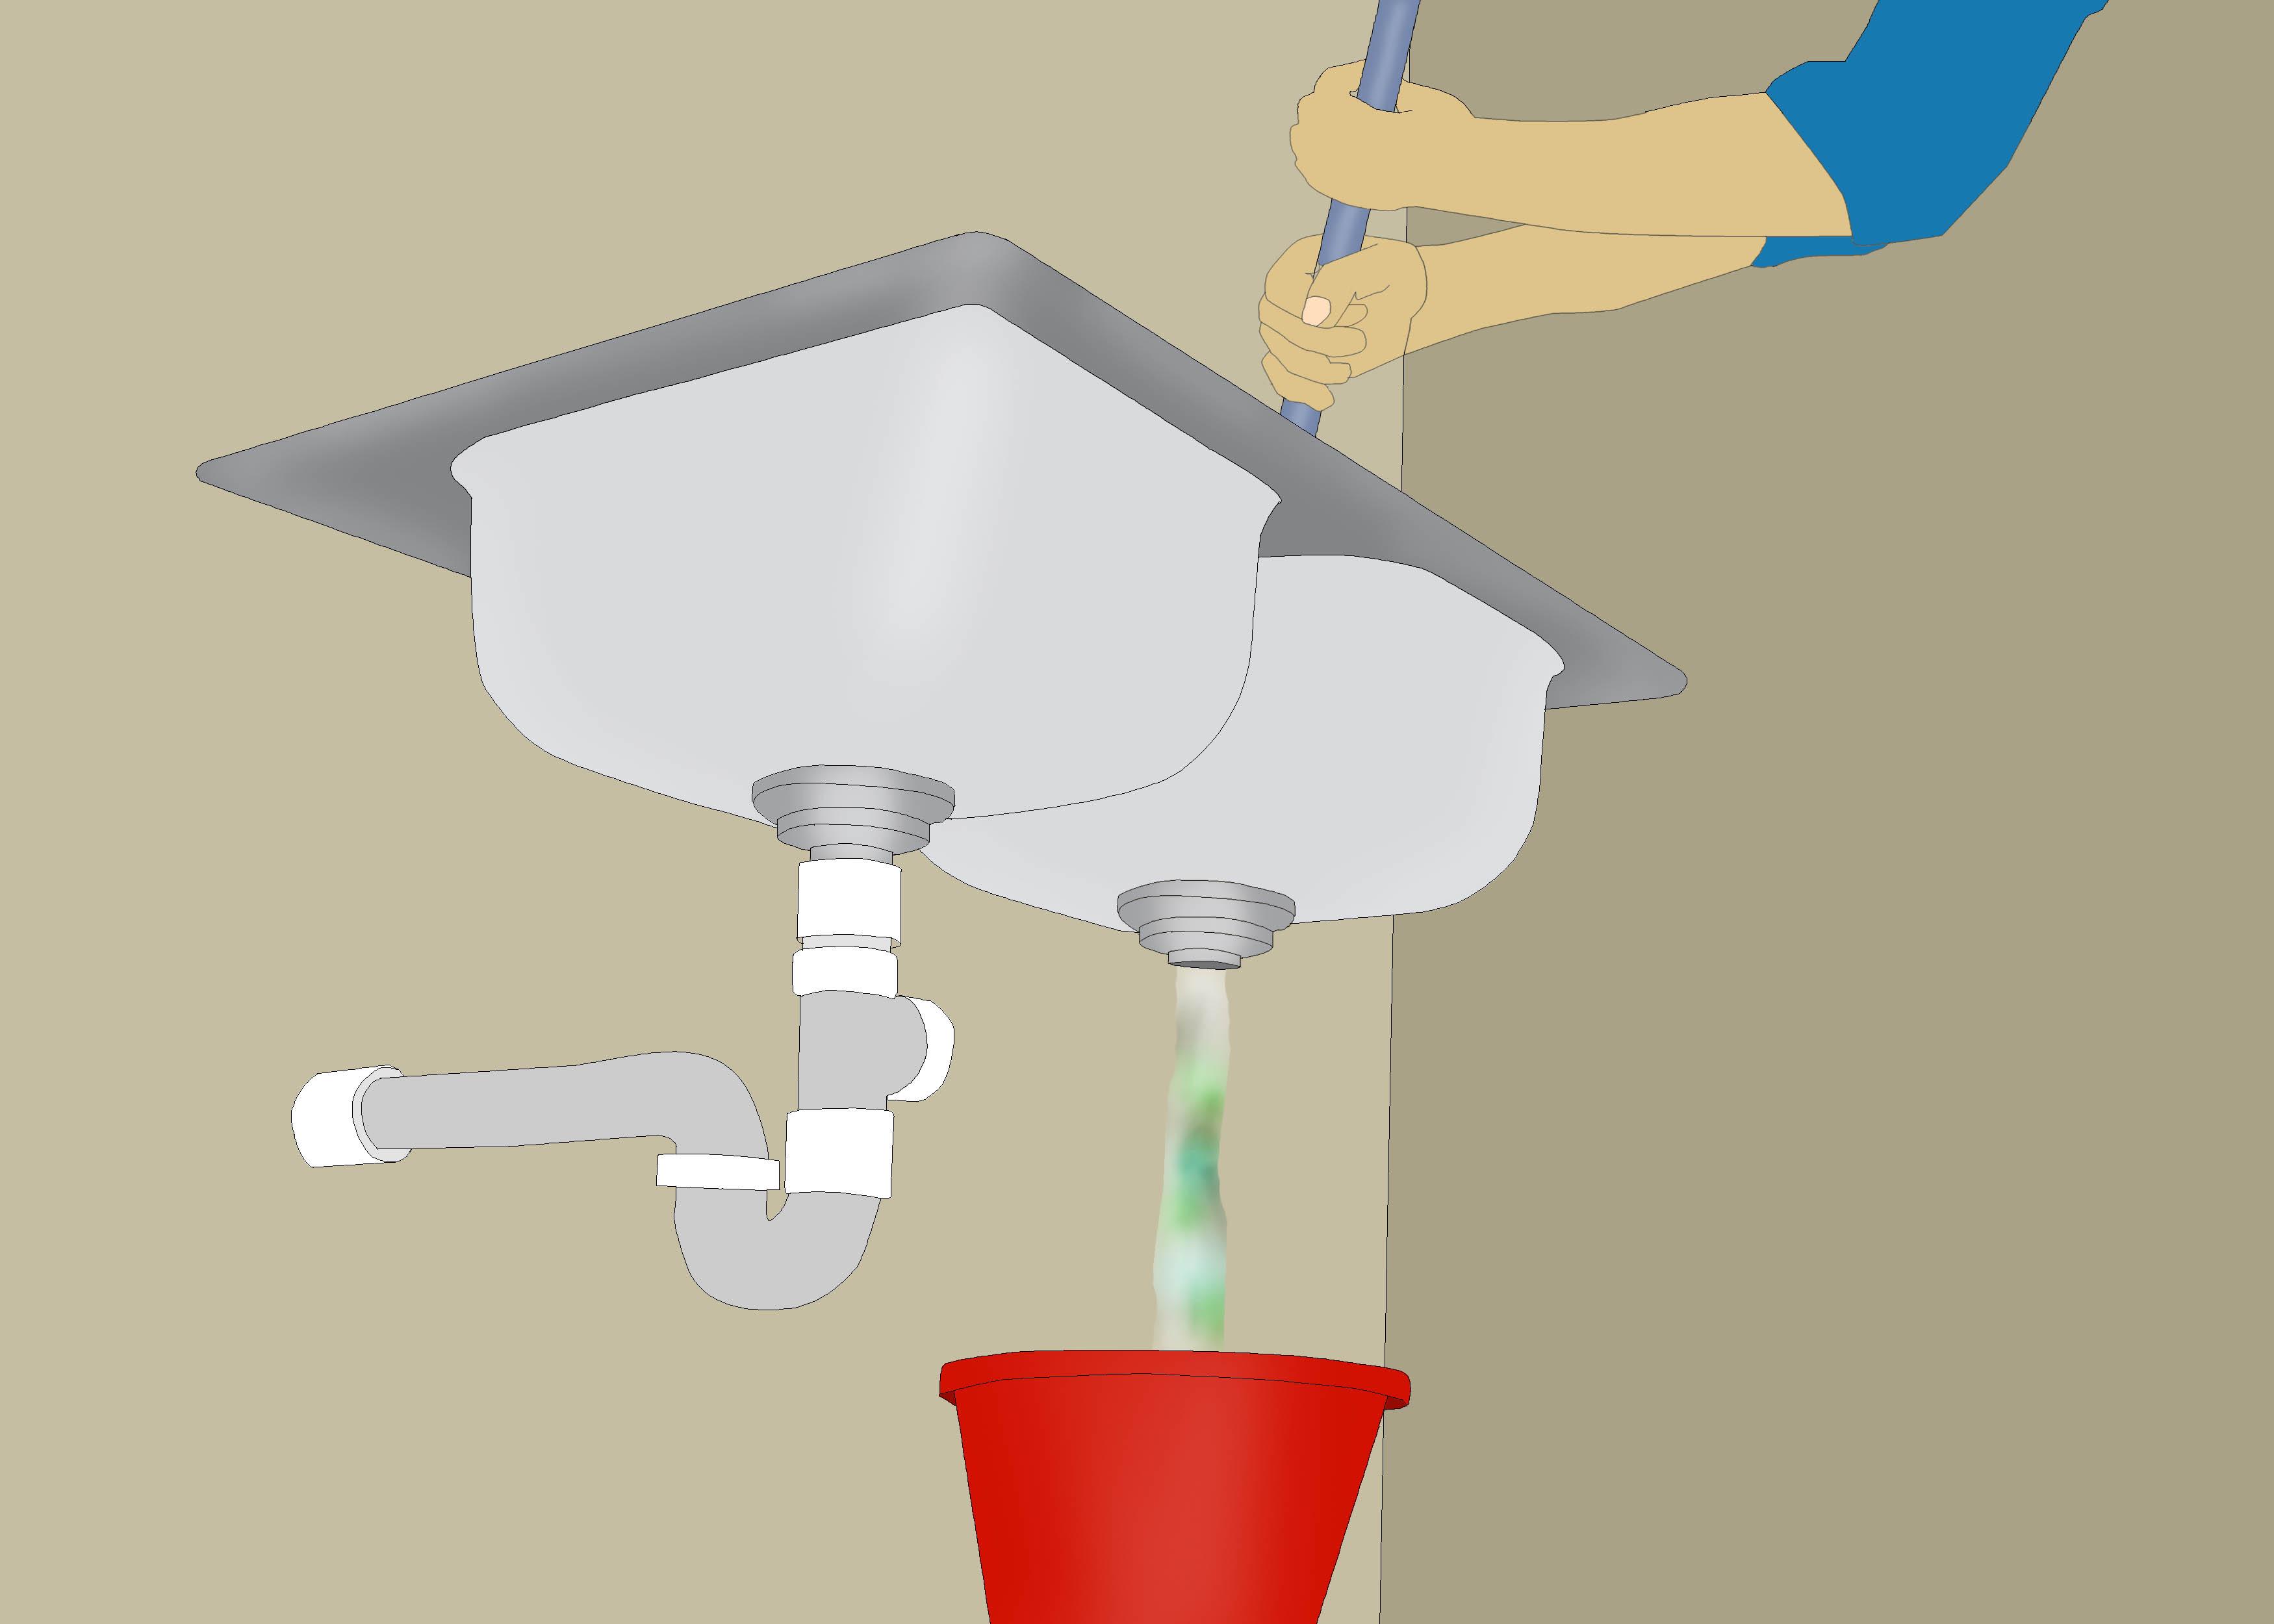 Restore Water Flow To a Clogged Kitchen Drain kitchen sink draining slowly